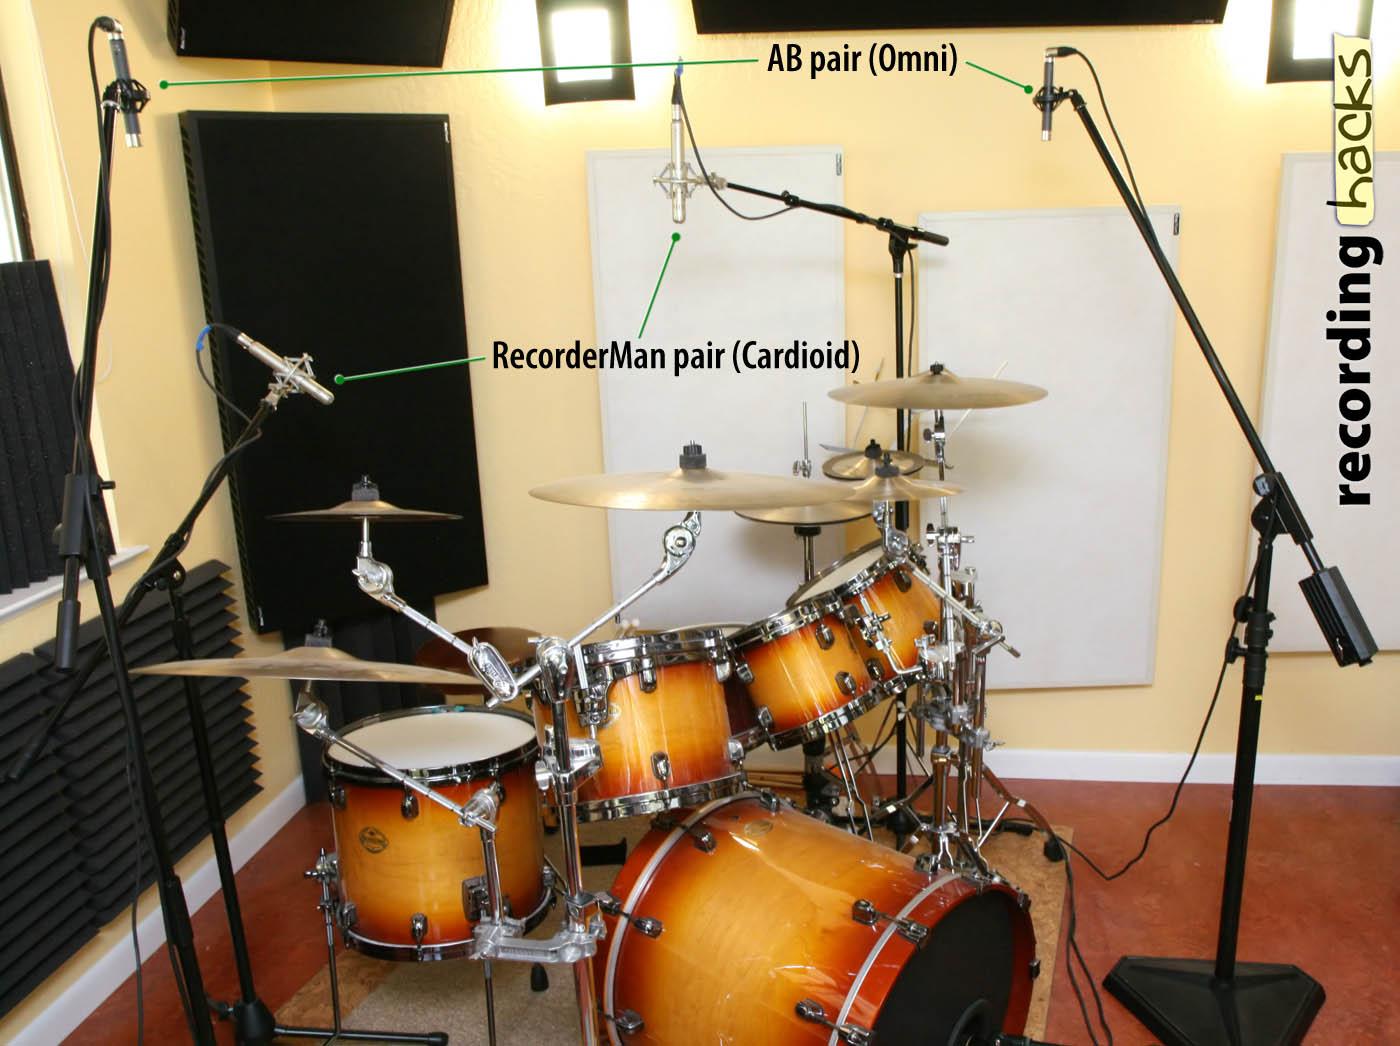 tube sdcs on drum overheads recording hacks. Black Bedroom Furniture Sets. Home Design Ideas